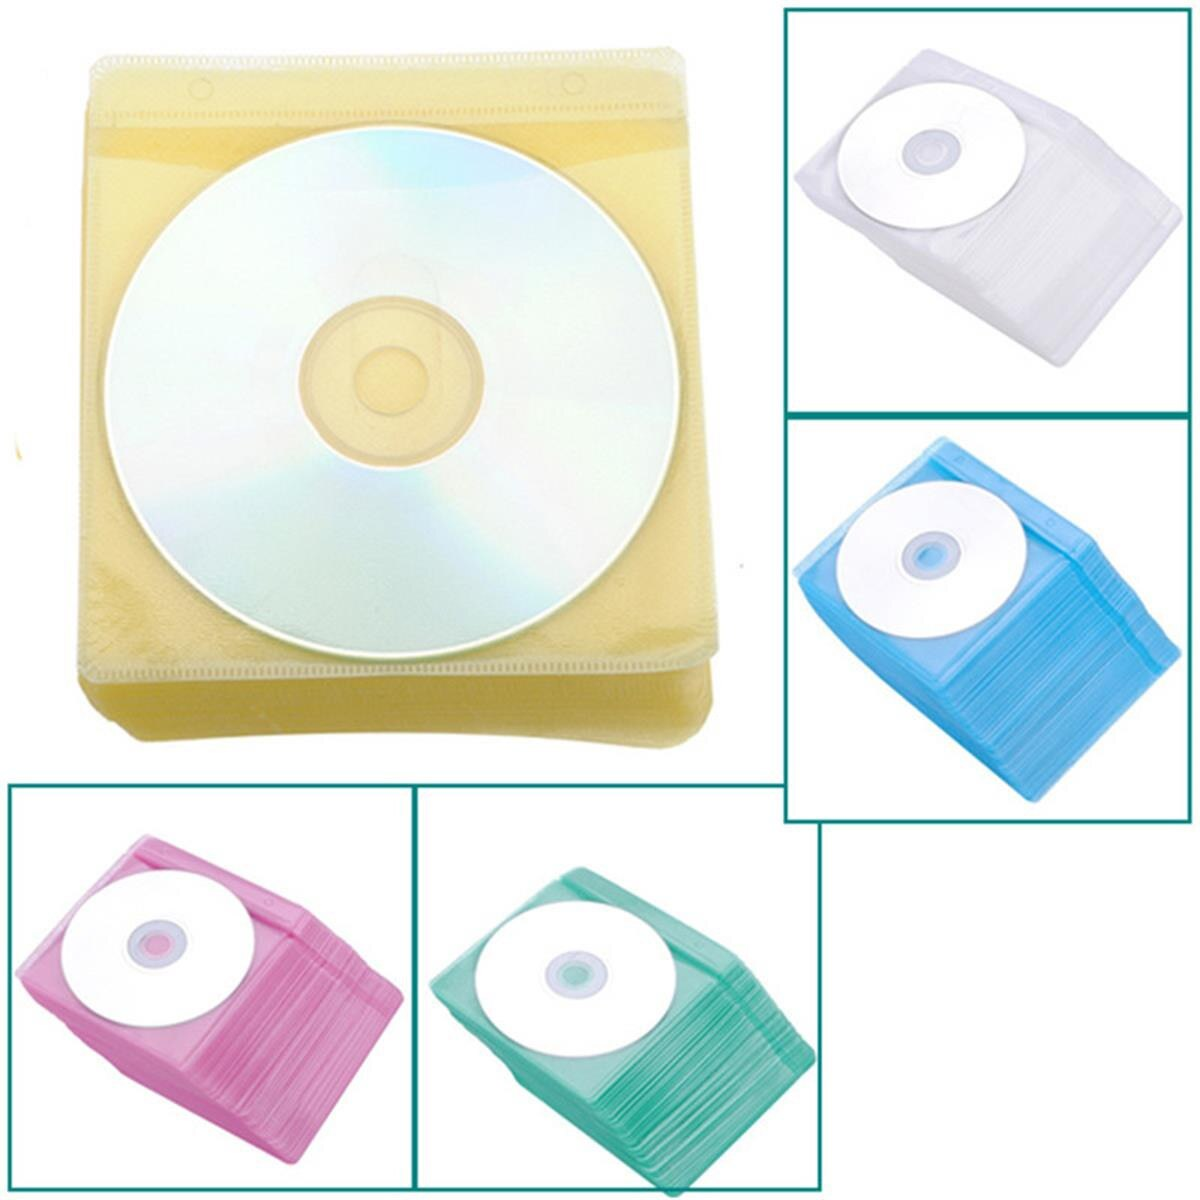 Gran oferta 100 Uds CD DVD funda transparente bolsa de almacenamiento Bolsa PP bolsa protectora portátil sobres soporte bolsa organizadora